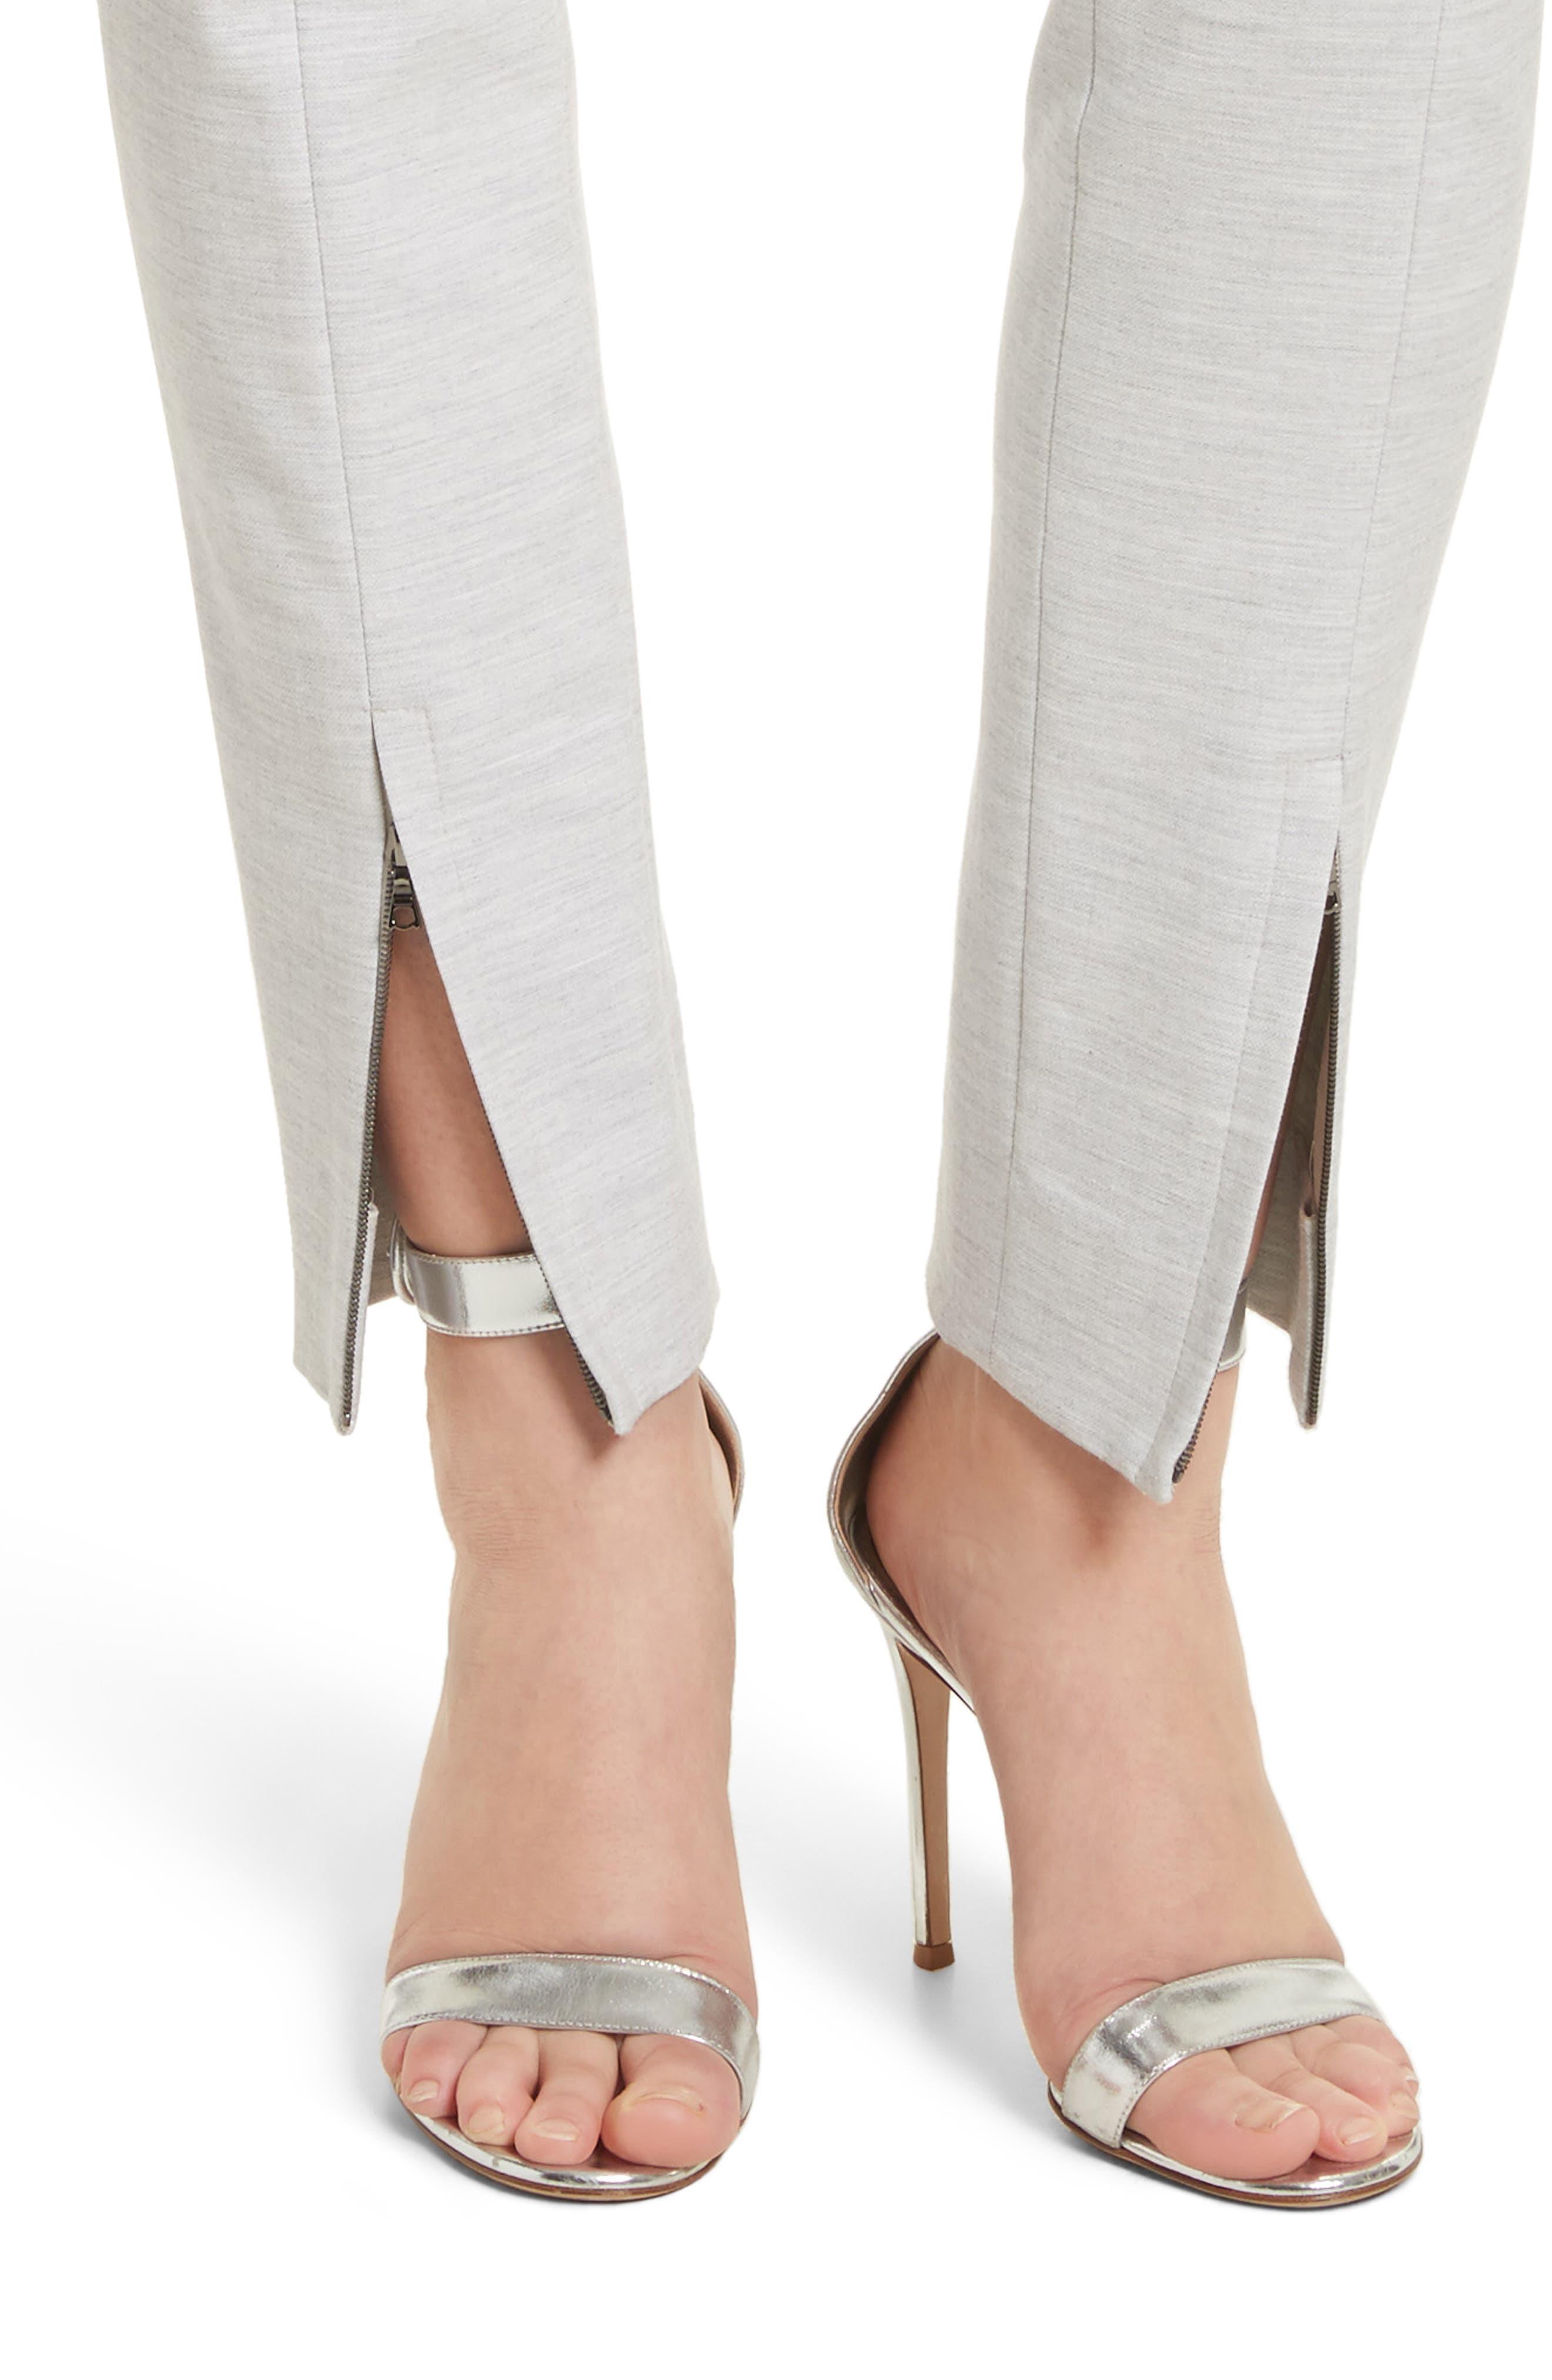 Summer Bella Double Weave Pants,                             Alternate thumbnail 9, color,                             Light Grey Melange